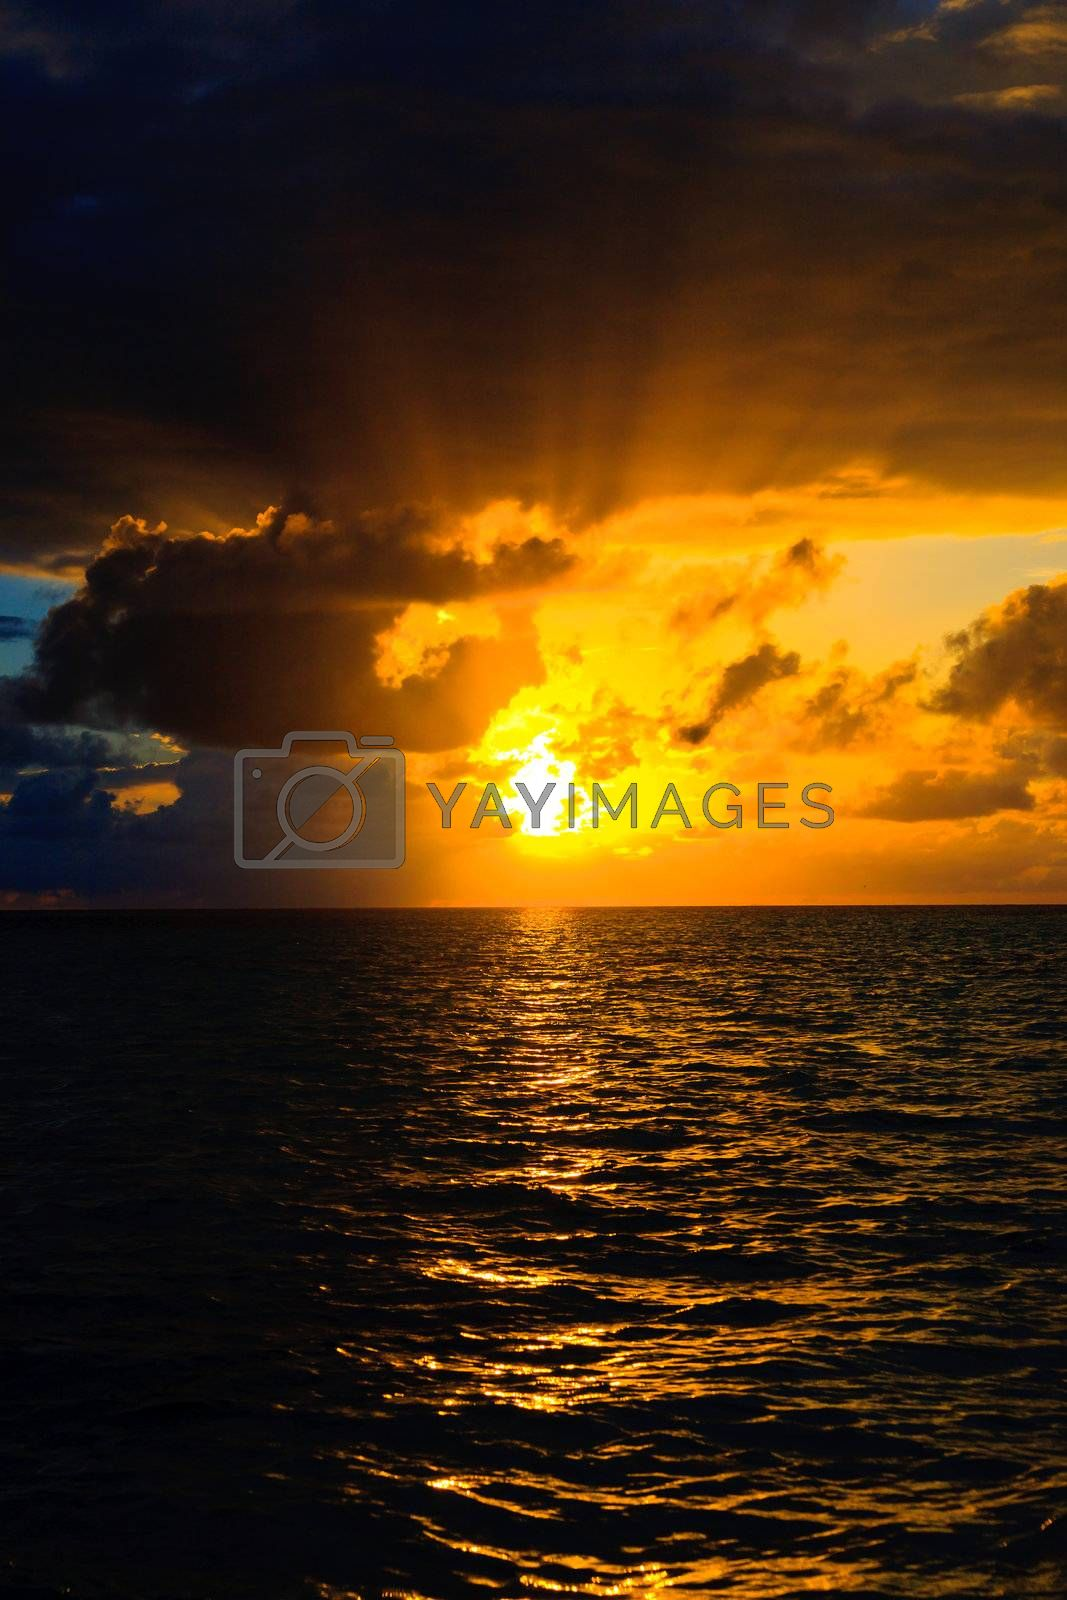 Royalty free image of Maldivian Sunset by anobis